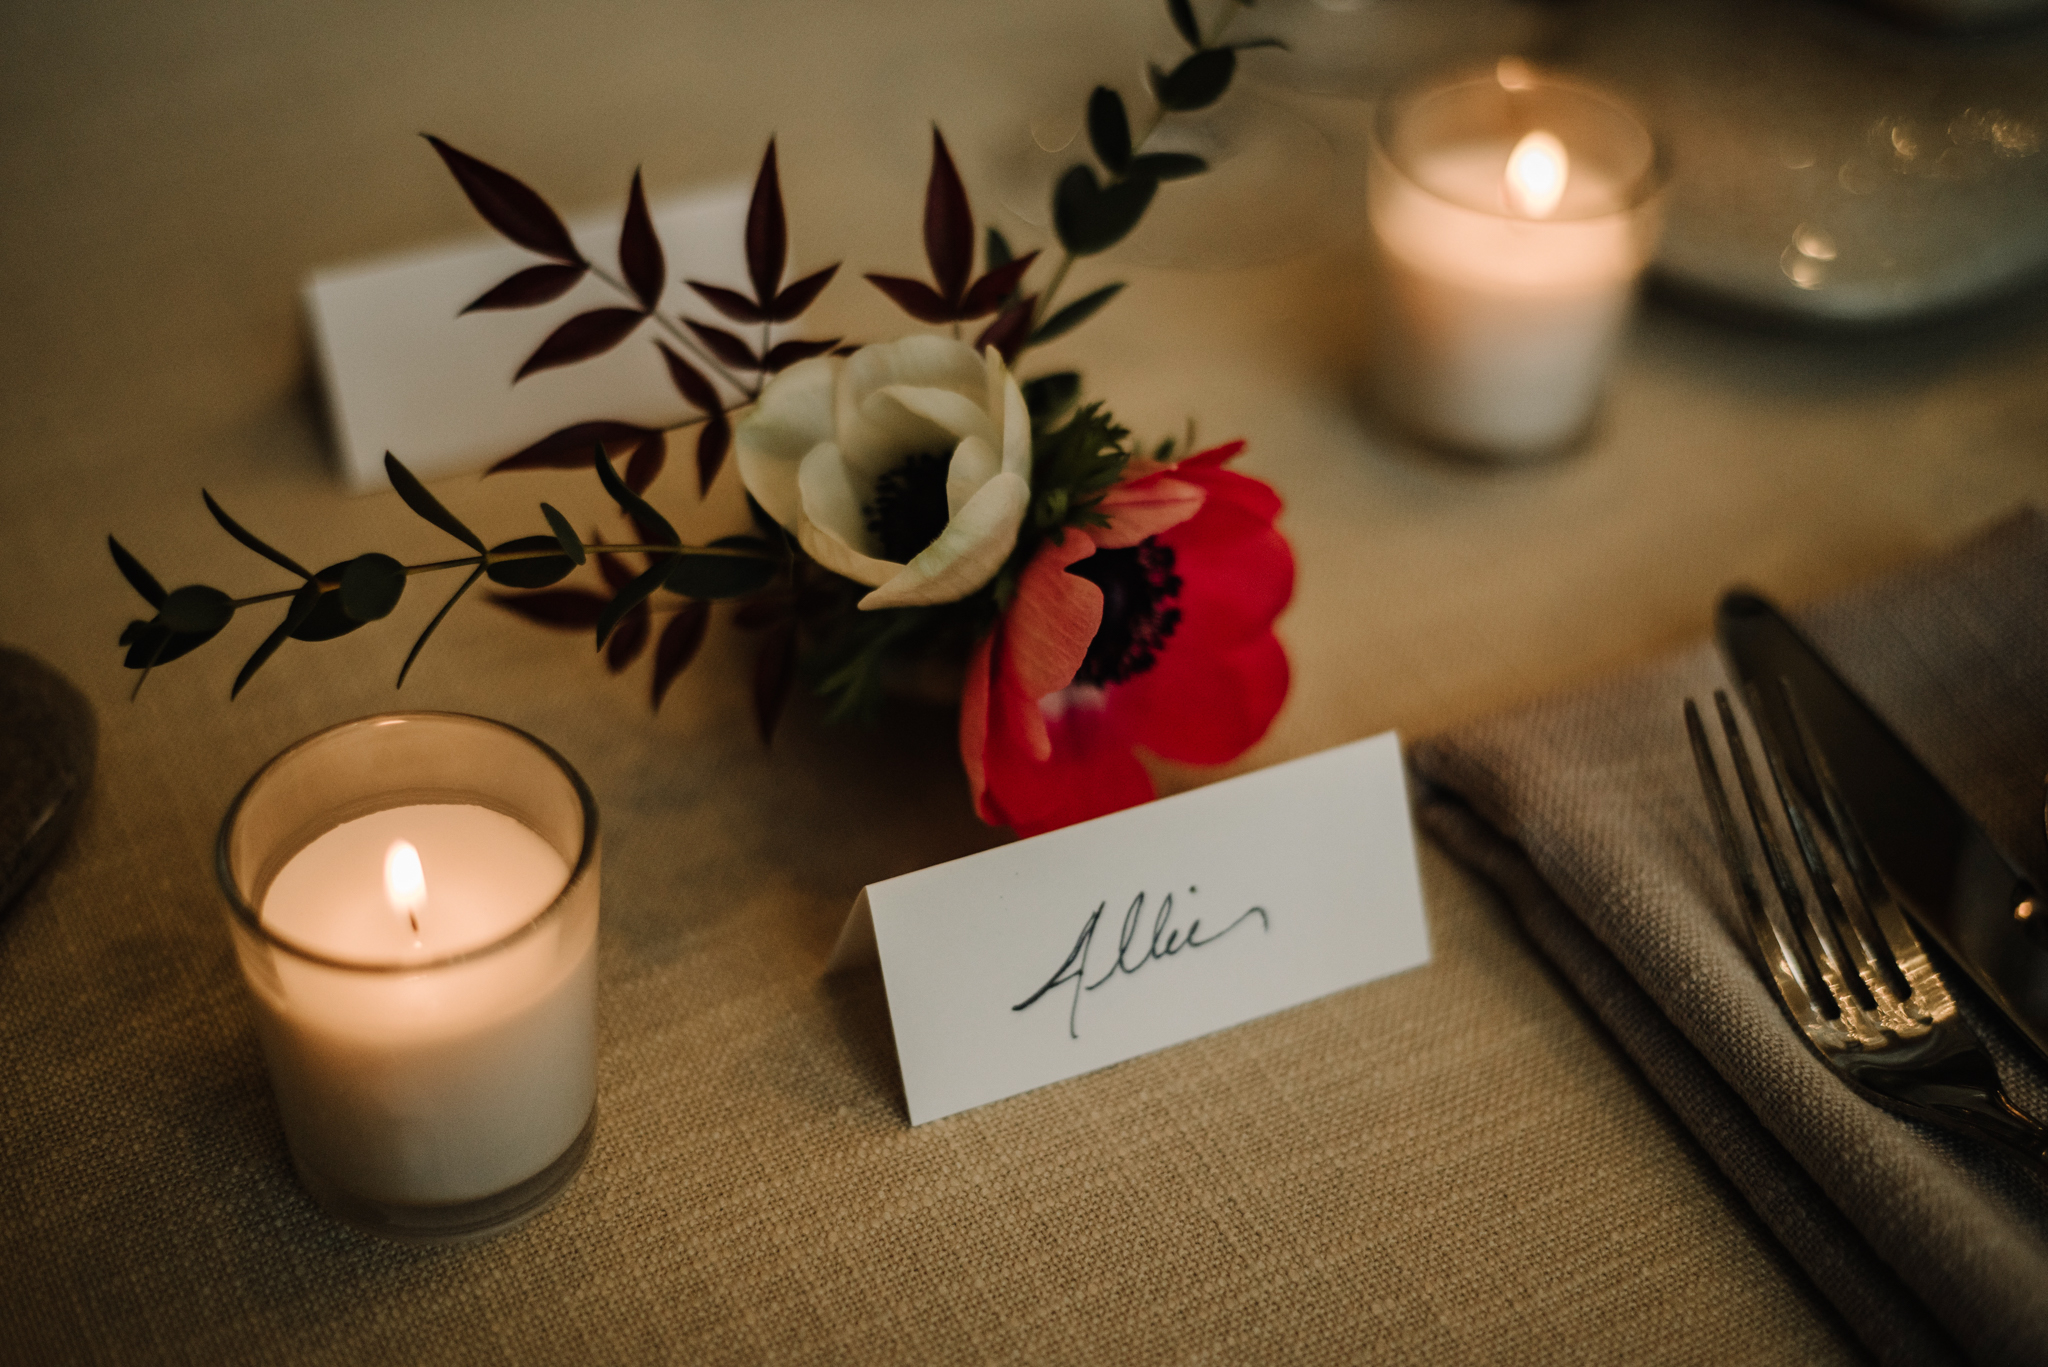 Intimate Dinner Wedding - Small Wedding with Candlelit Dinner - Sperryville Virginia Wedding - Backyard Wedding - Flourish Root Wedding Flowers - White Sails Creative Wedding - Cozy Wedding - Casual Wedding - Intimate Wedding_6.jpg